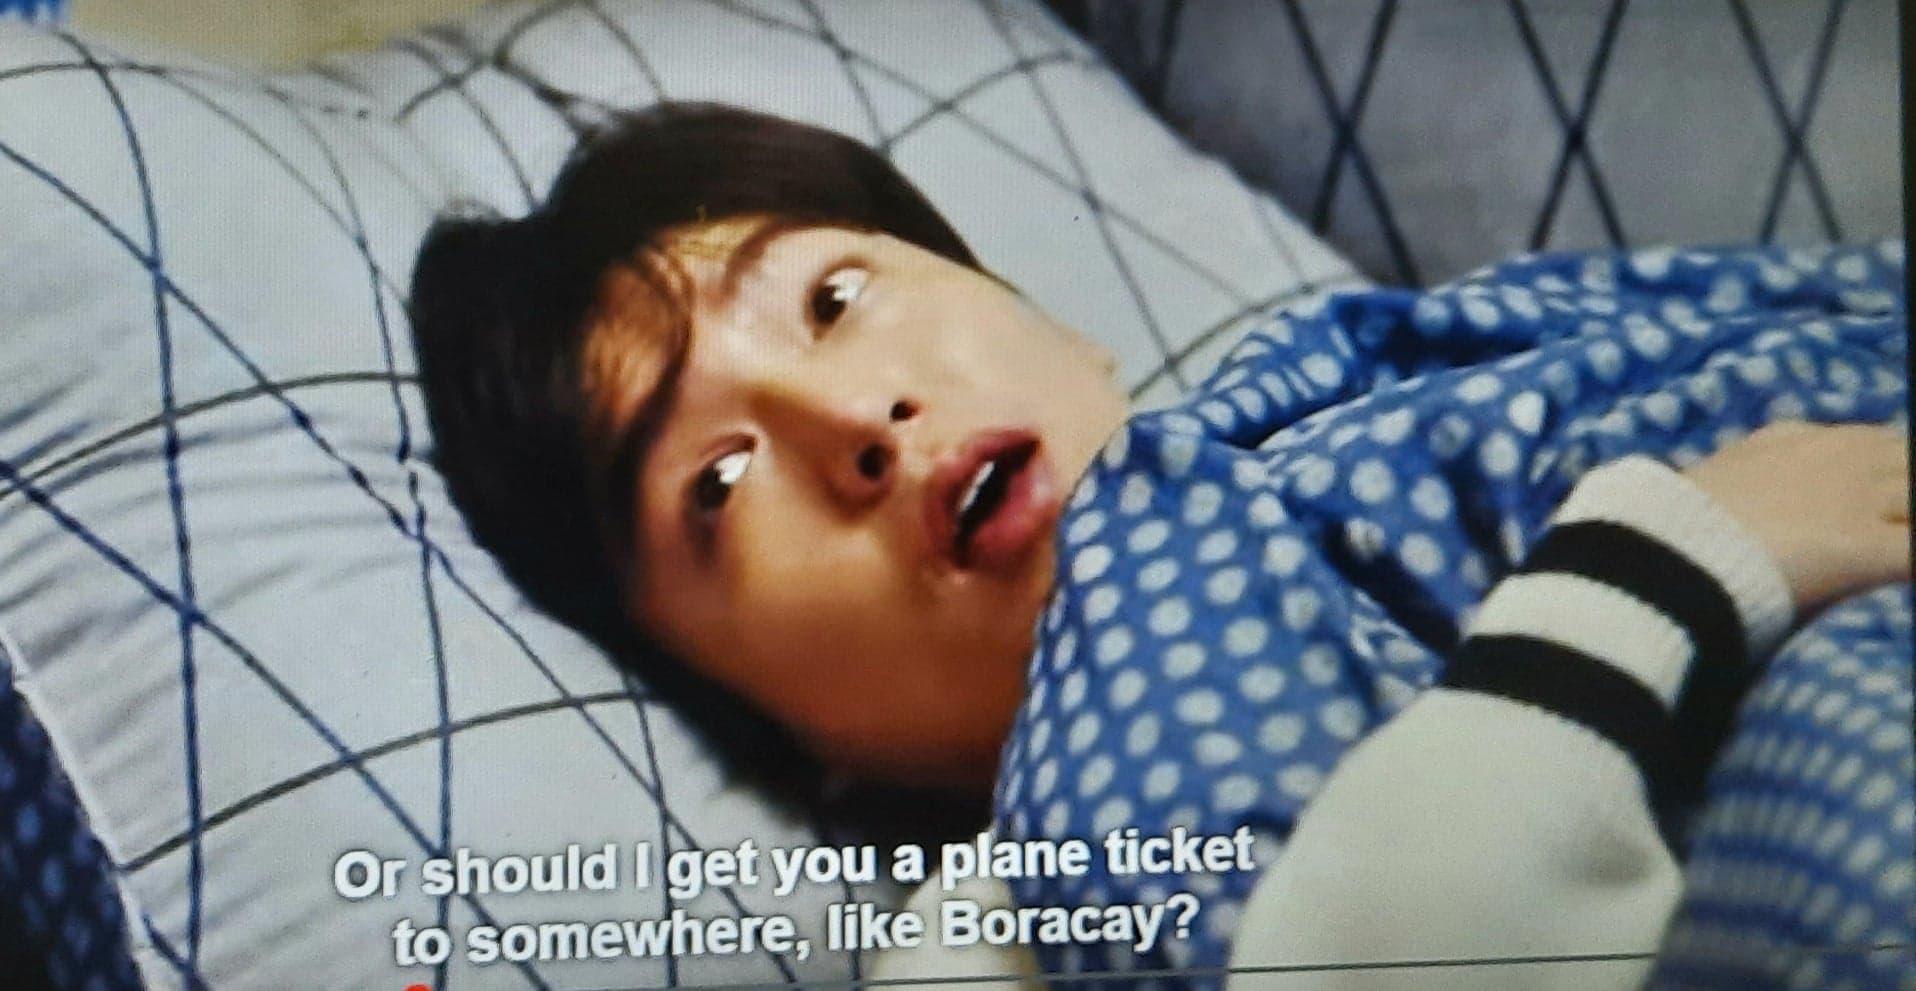 Legend of the Blue Sea scene mentioned Boracay